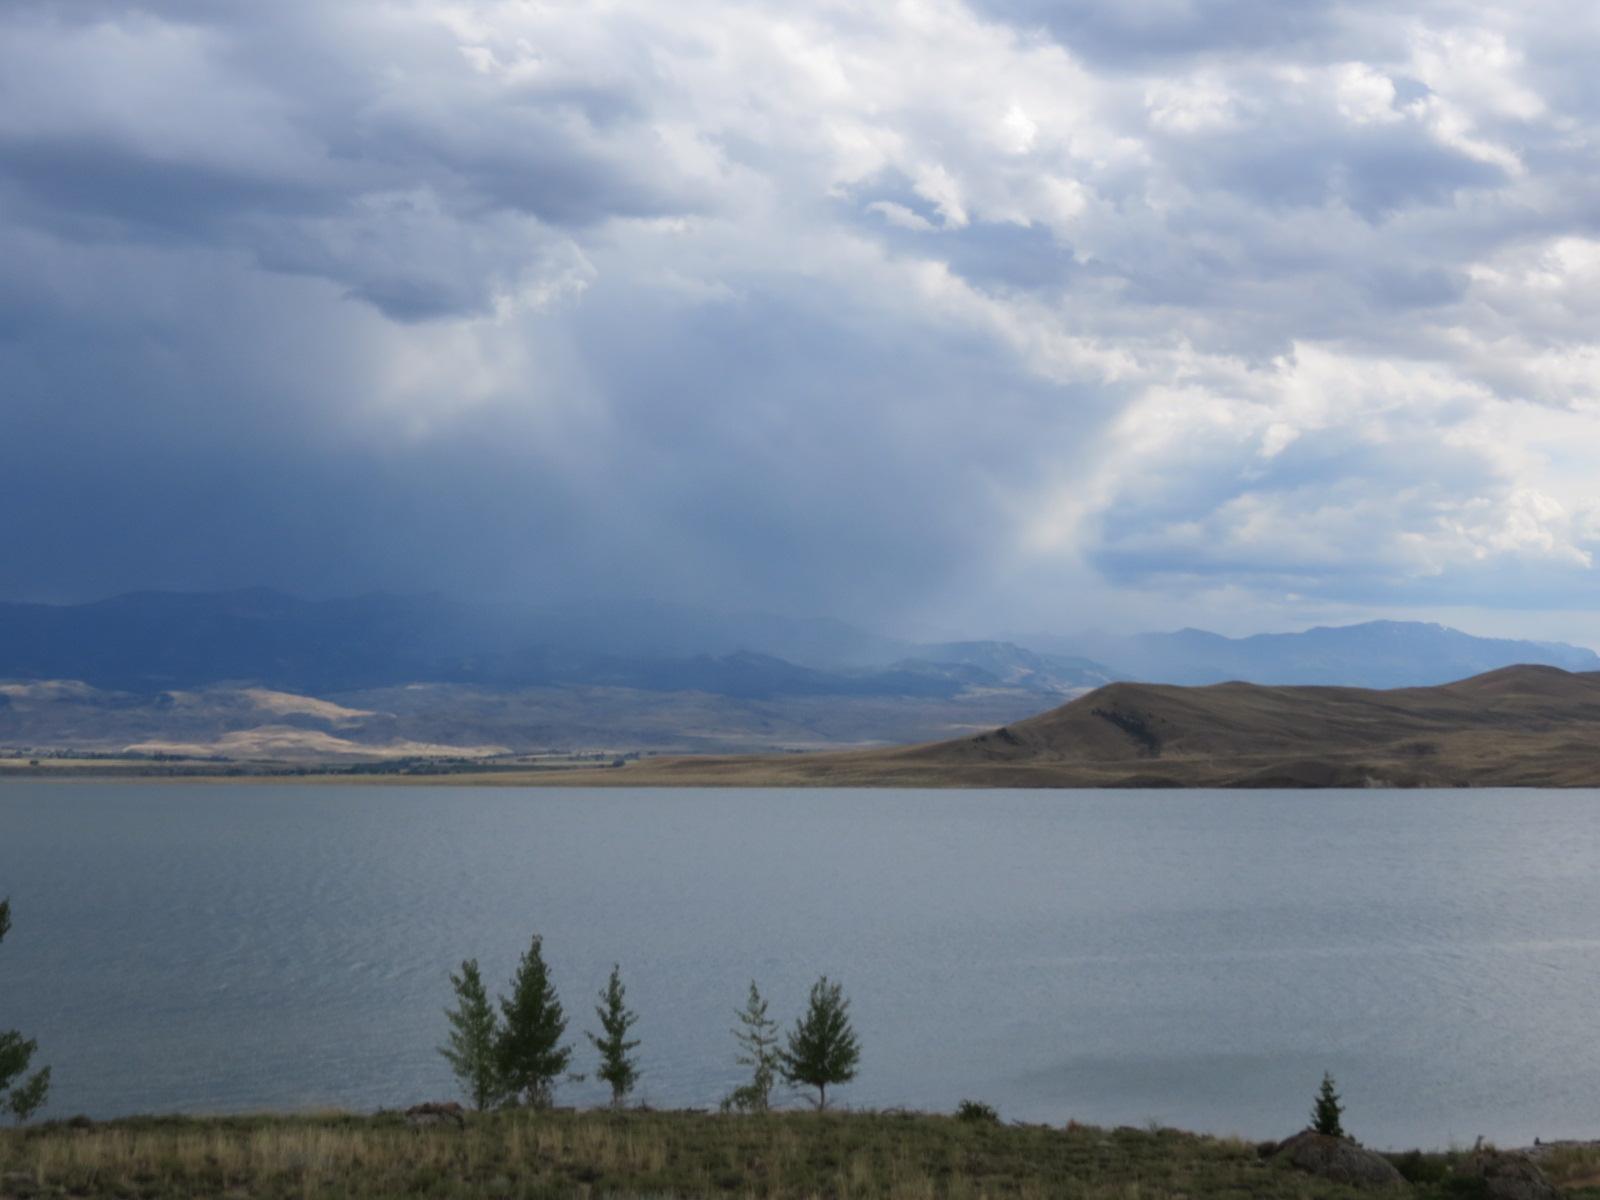 Storm coming across Buffalo Bill Dam on the Shoshone River